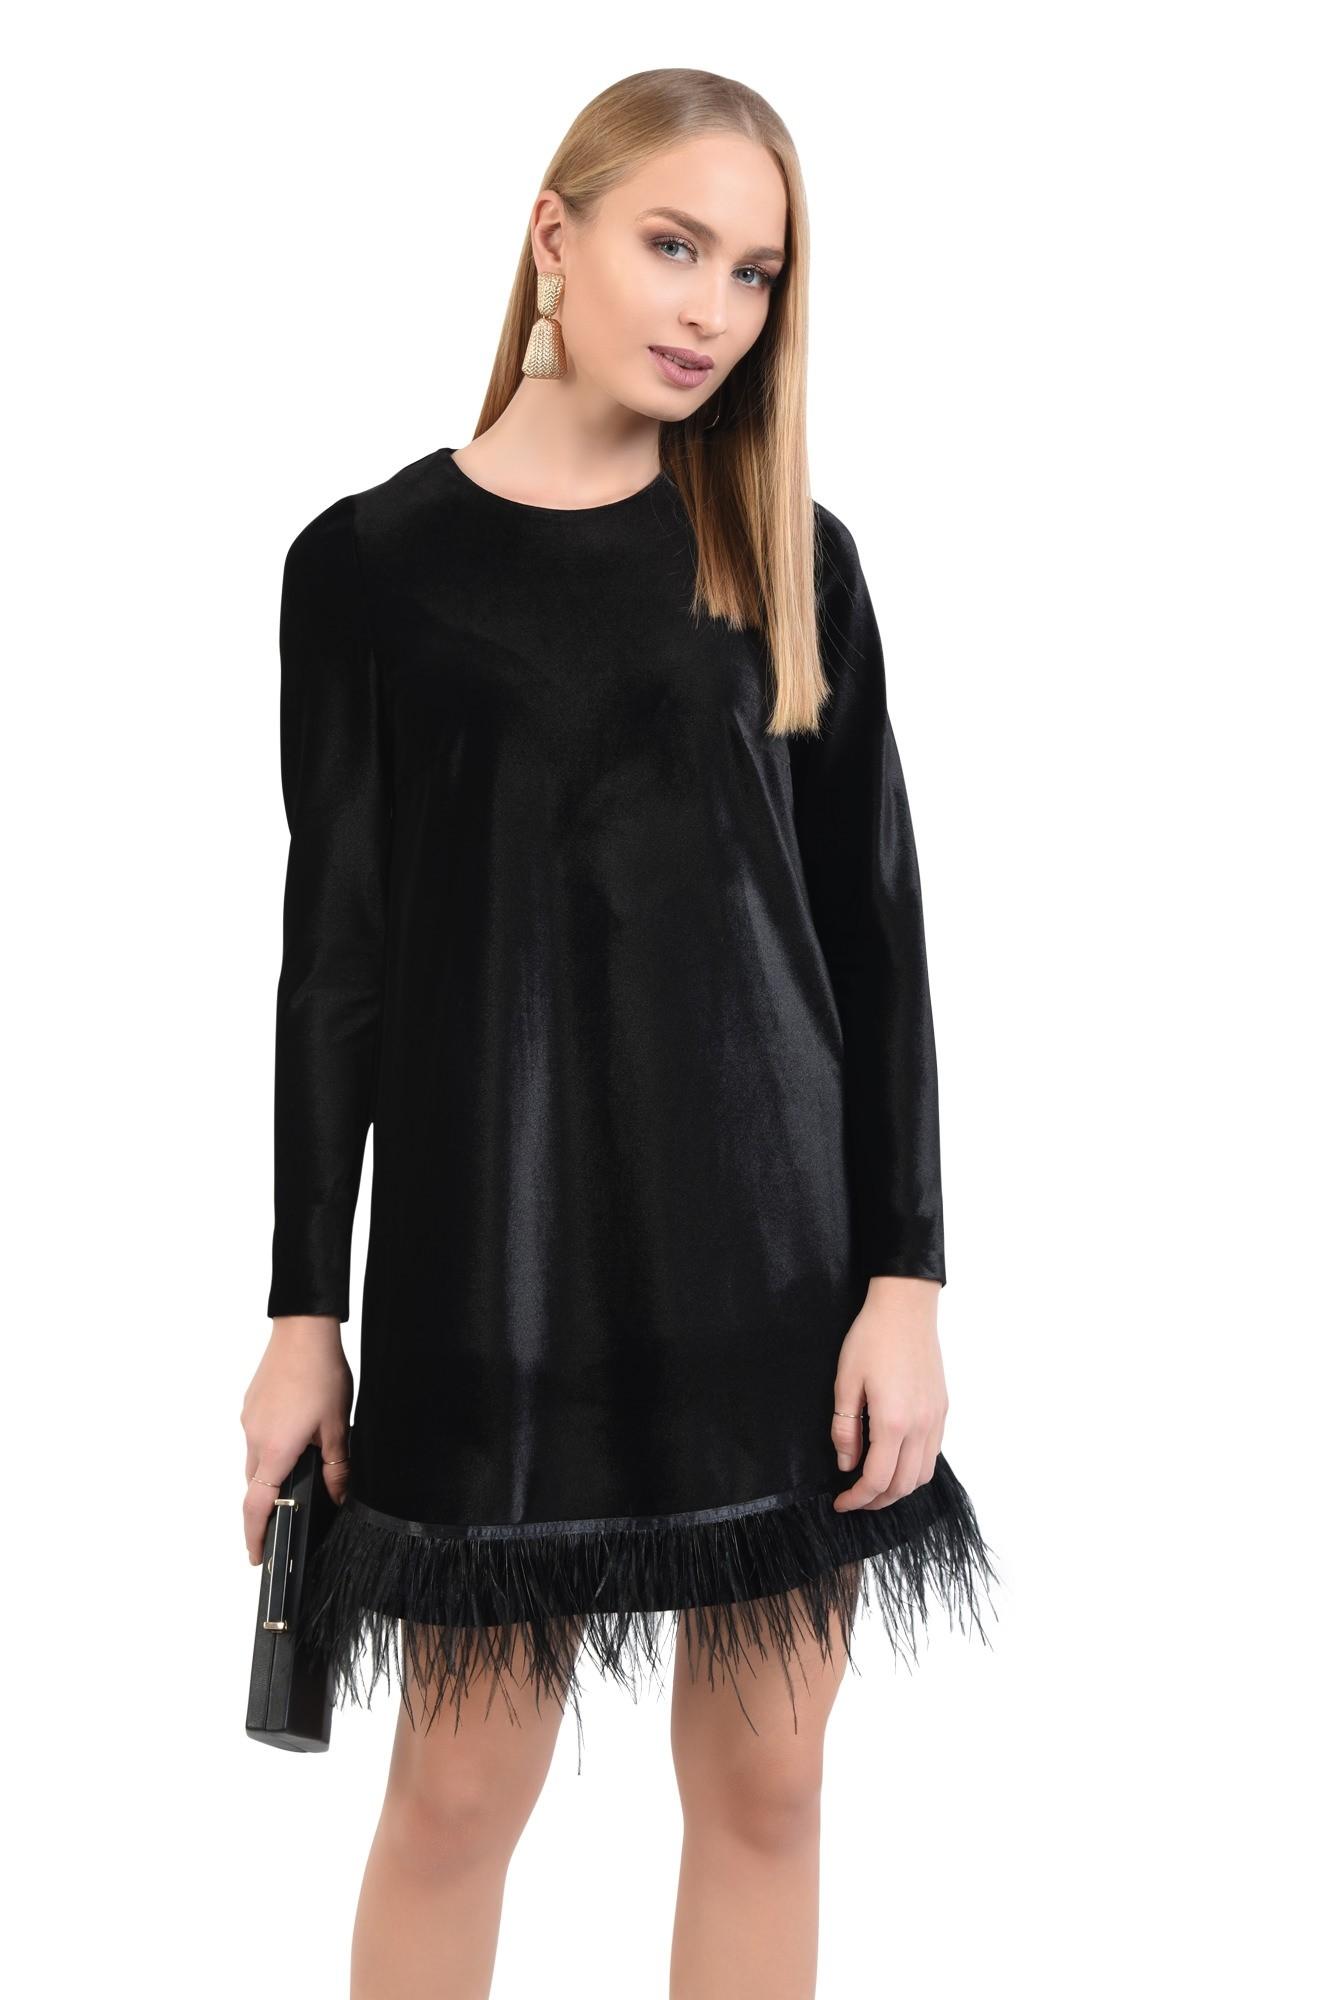 0 - rochie de seara, neagra, scurta, croi drept lejer, bordura din pene